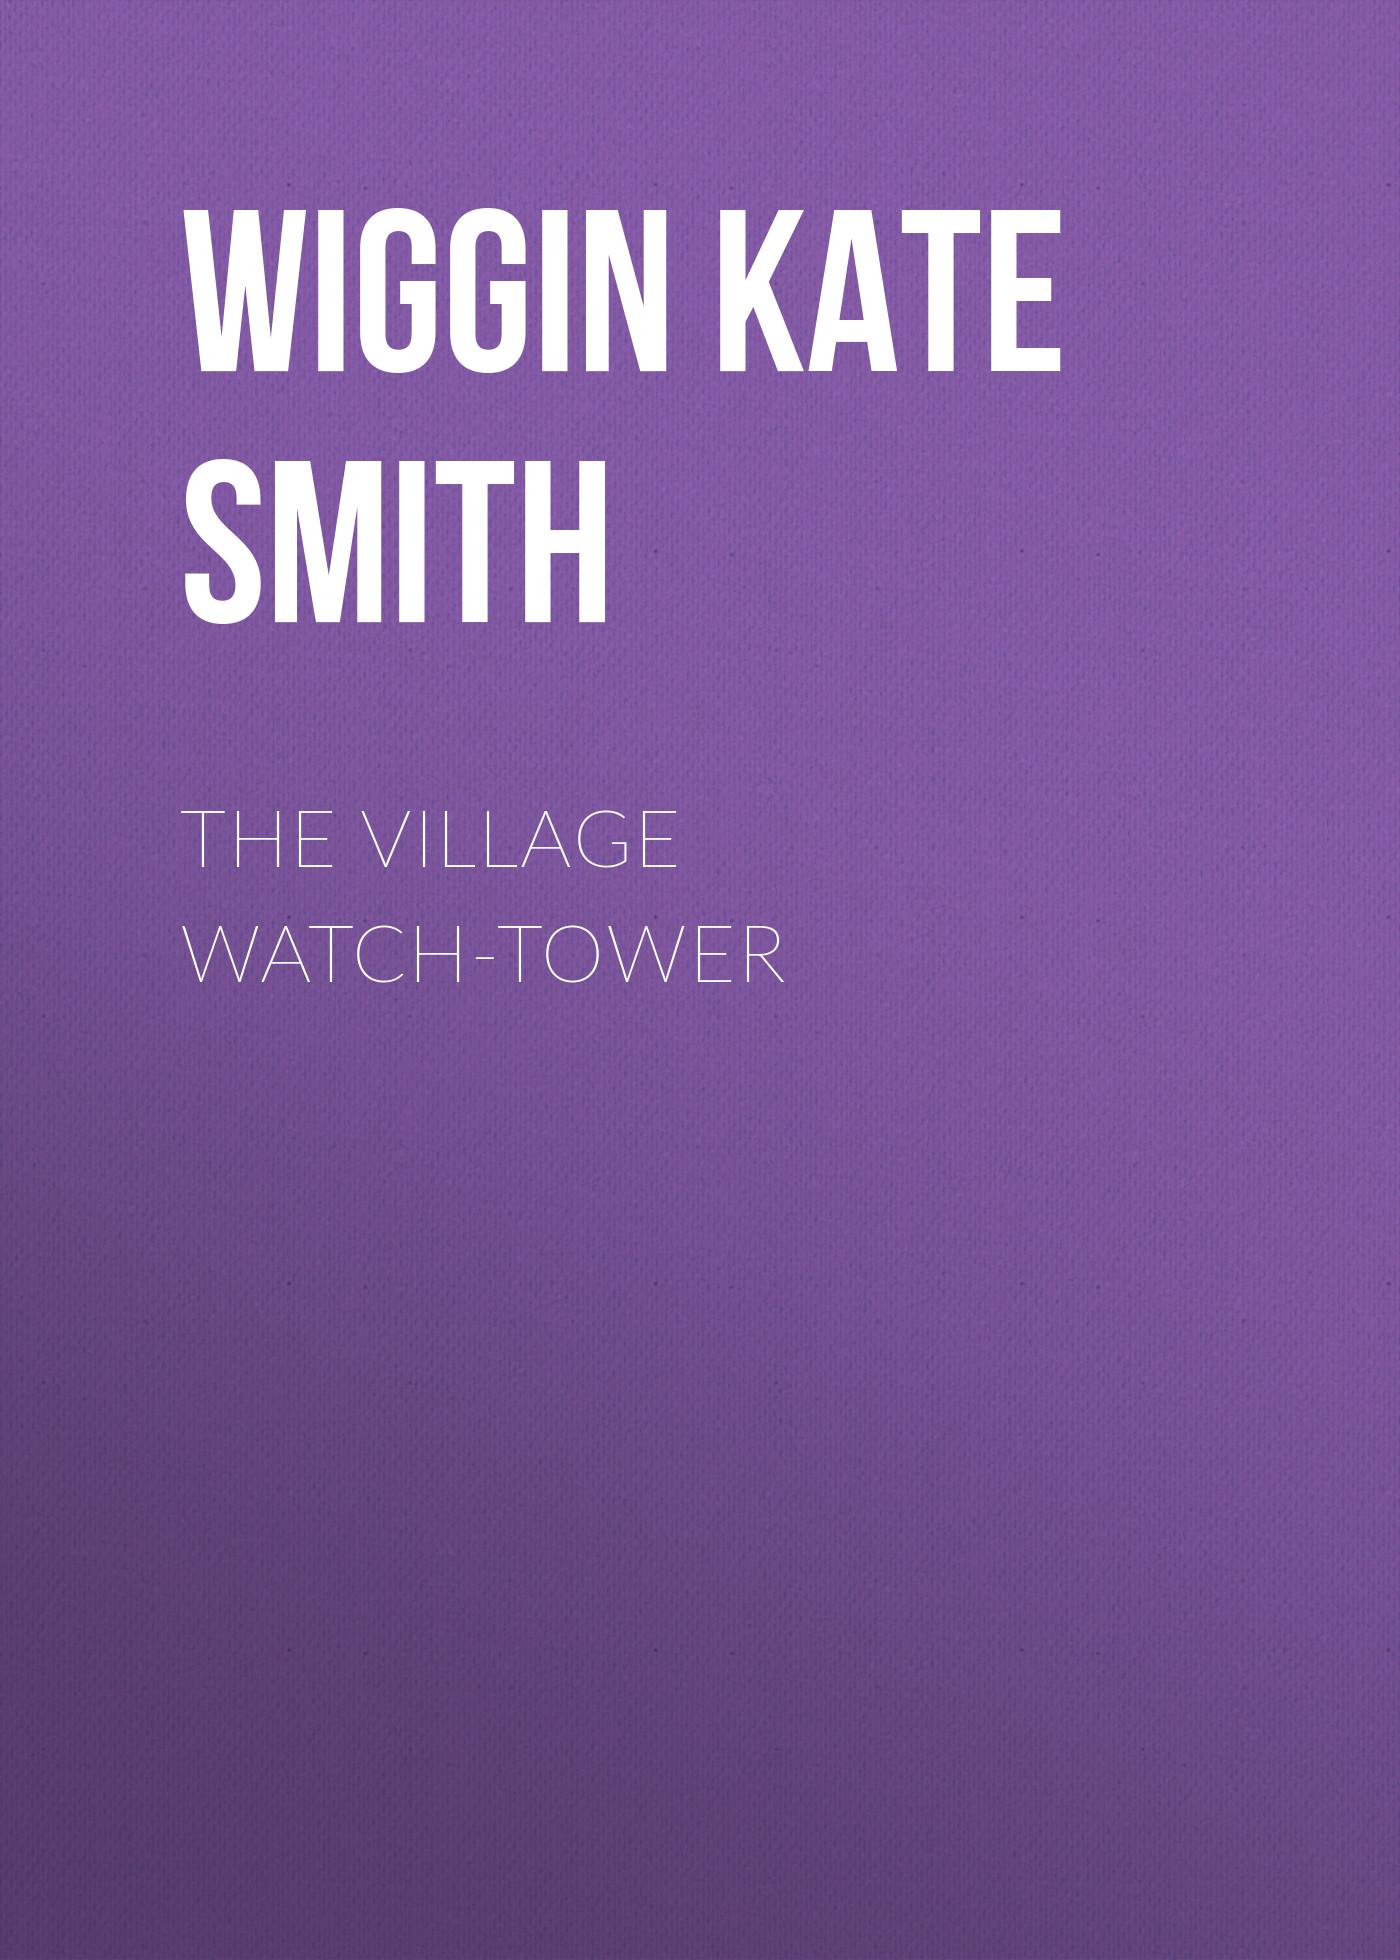 Wiggin Kate Douglas Smith The Village Watch-Tower kate douglas wiggin the bird s christmas carol by kate douglas wiggin fiction historical united states people